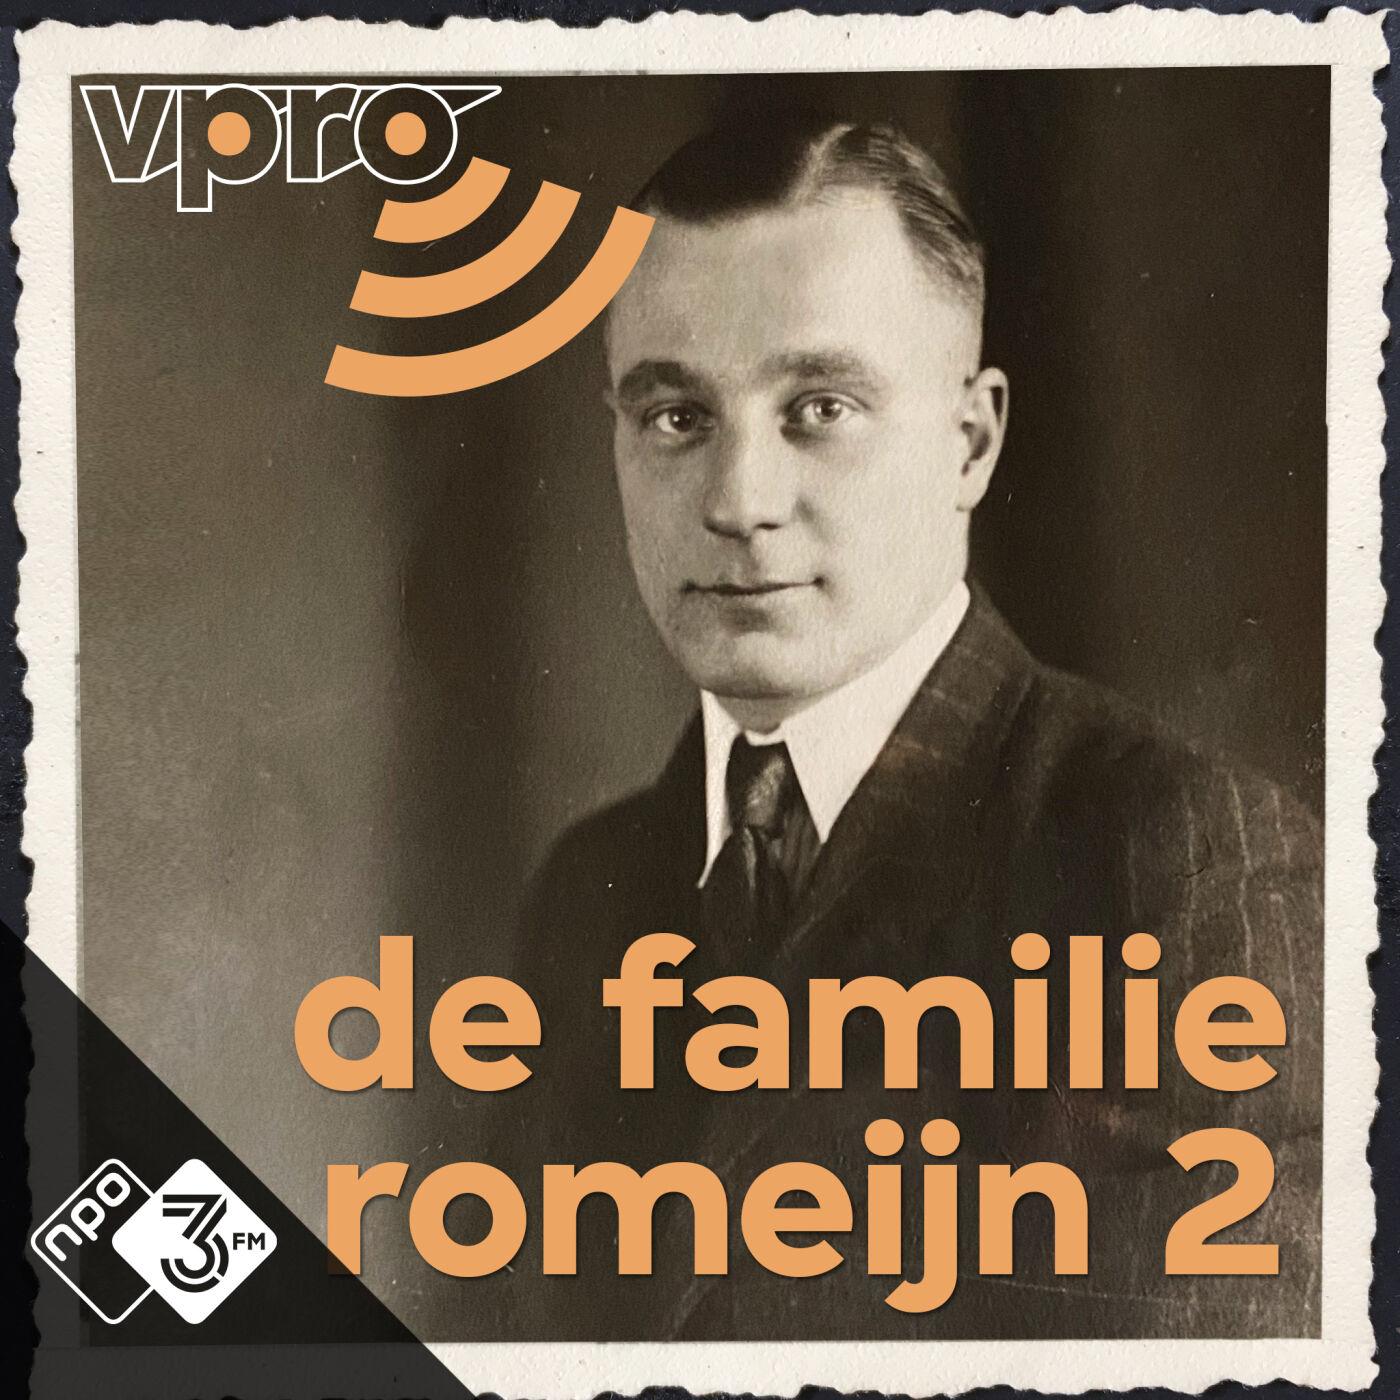 De Familie Romeijn logo